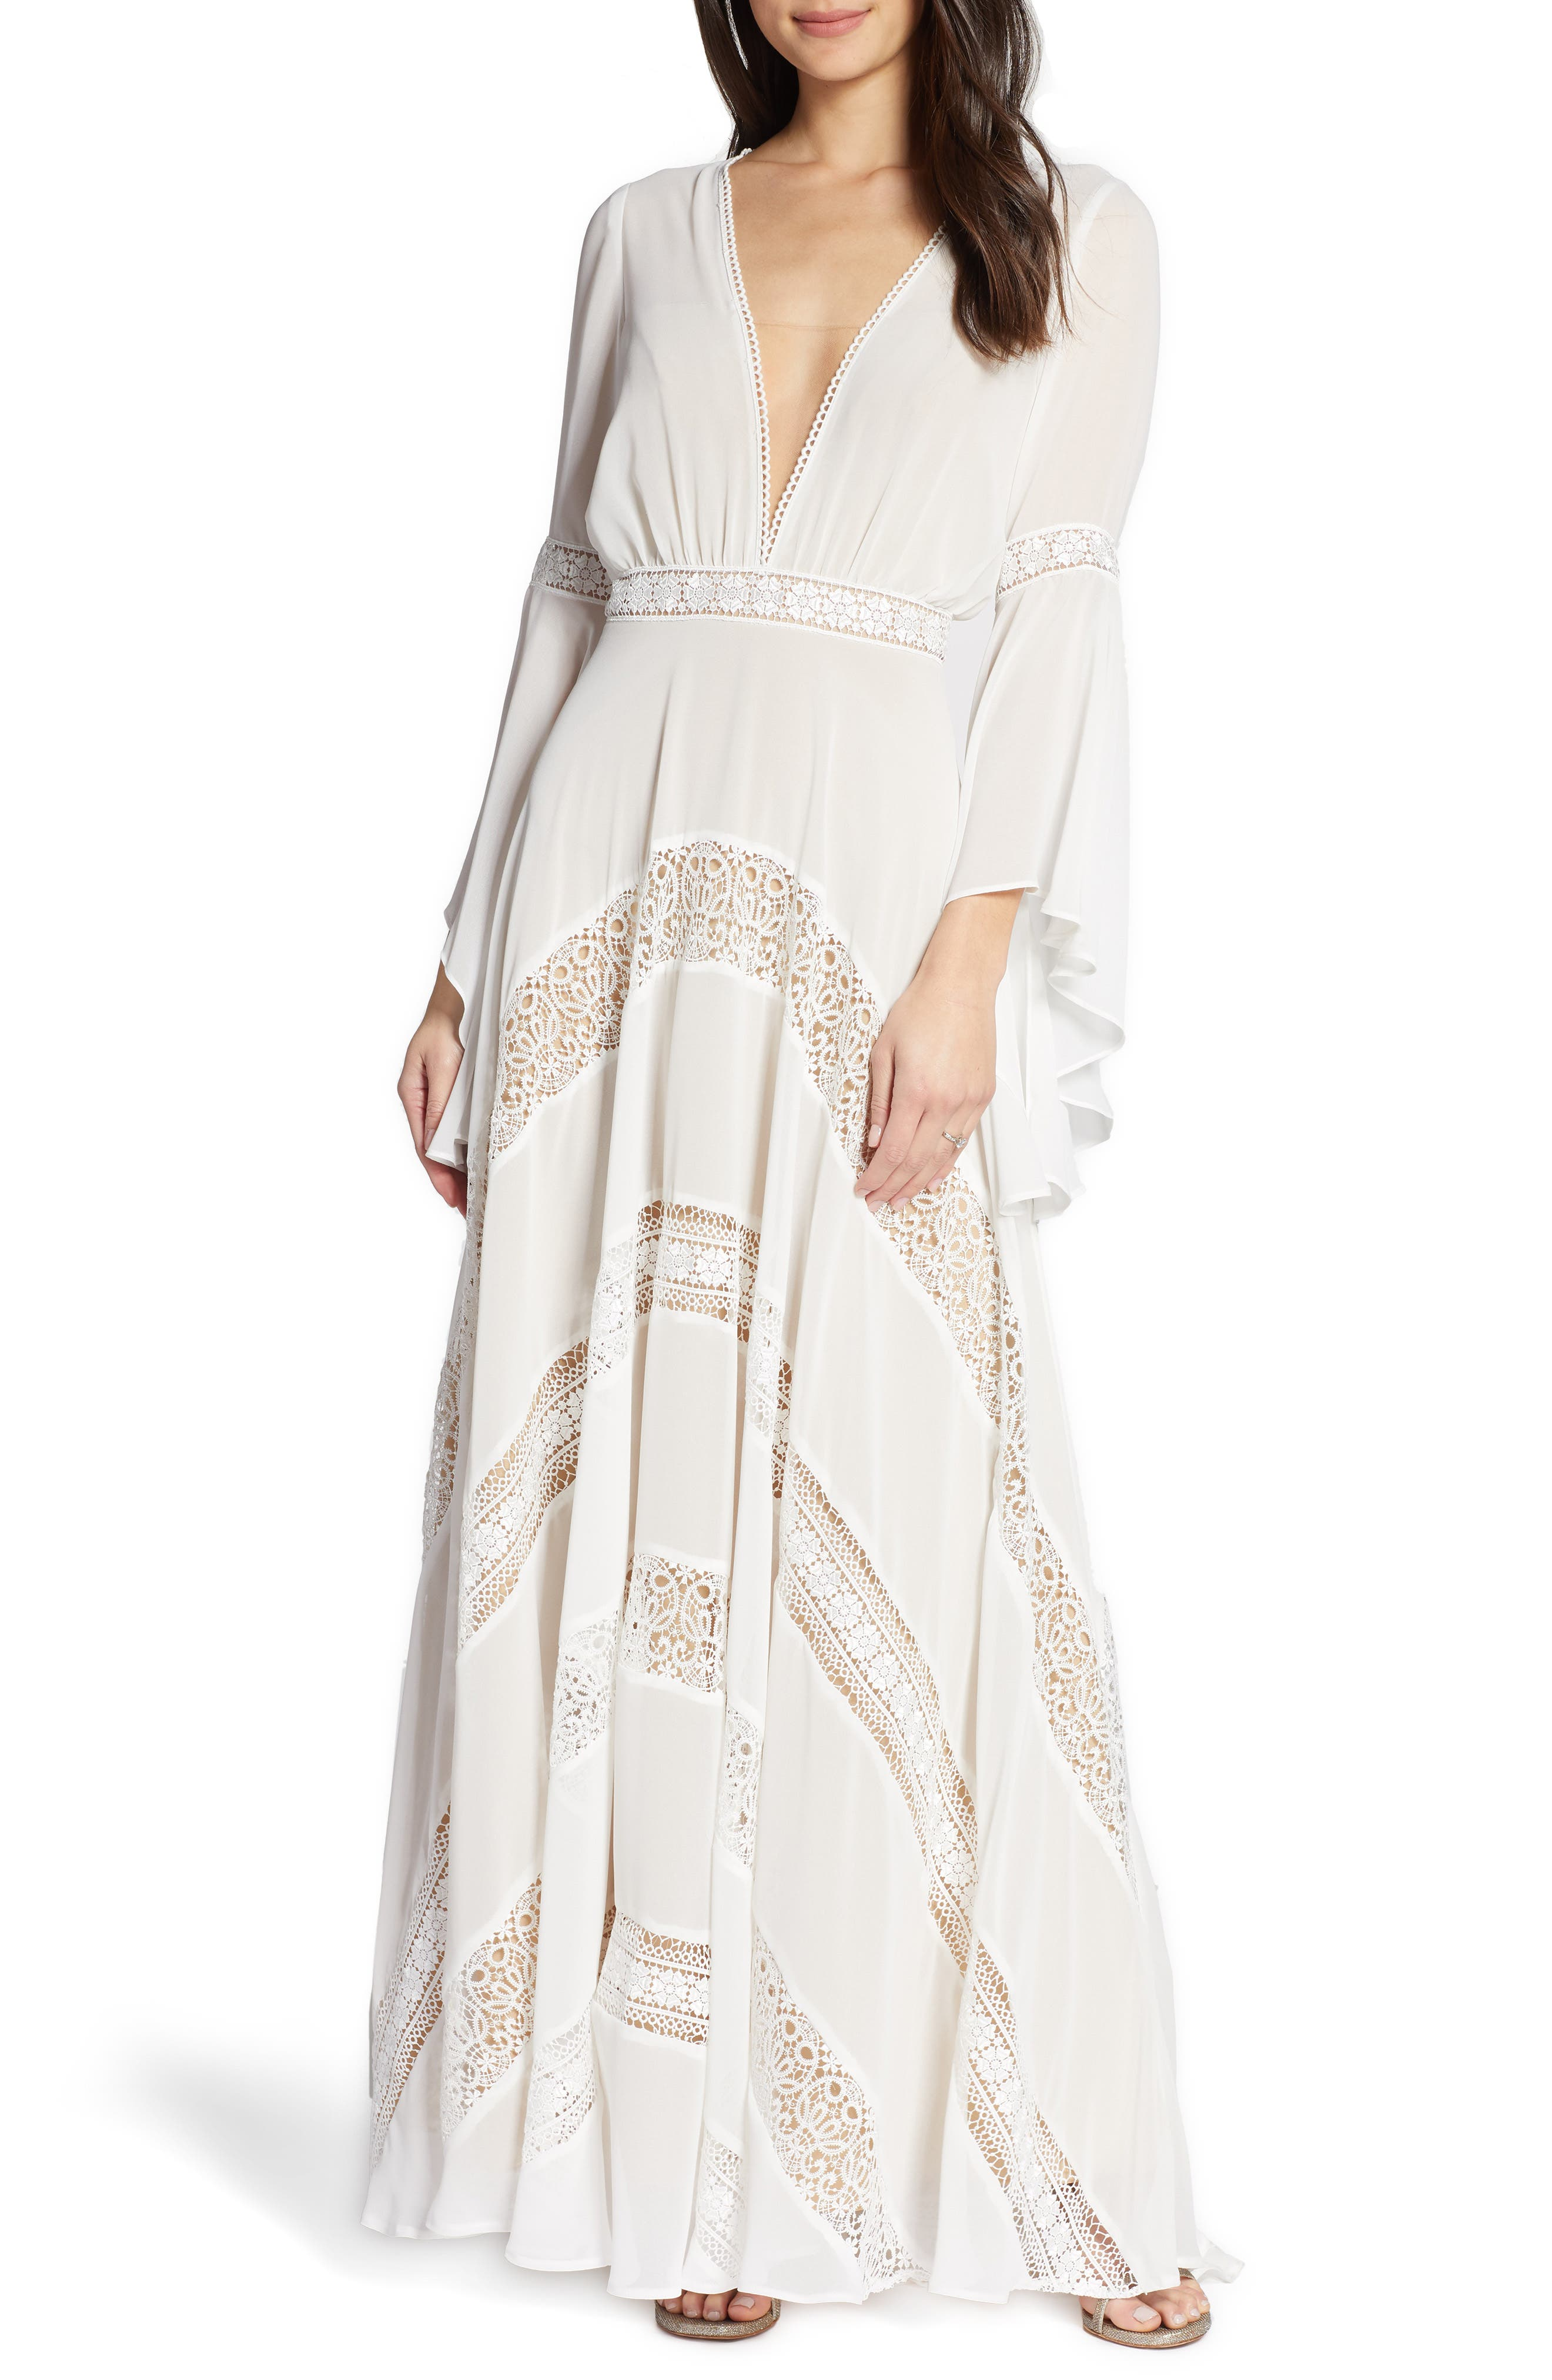 By Watters Chevron Lace Long Sleeve Wedding Dress, Ivory